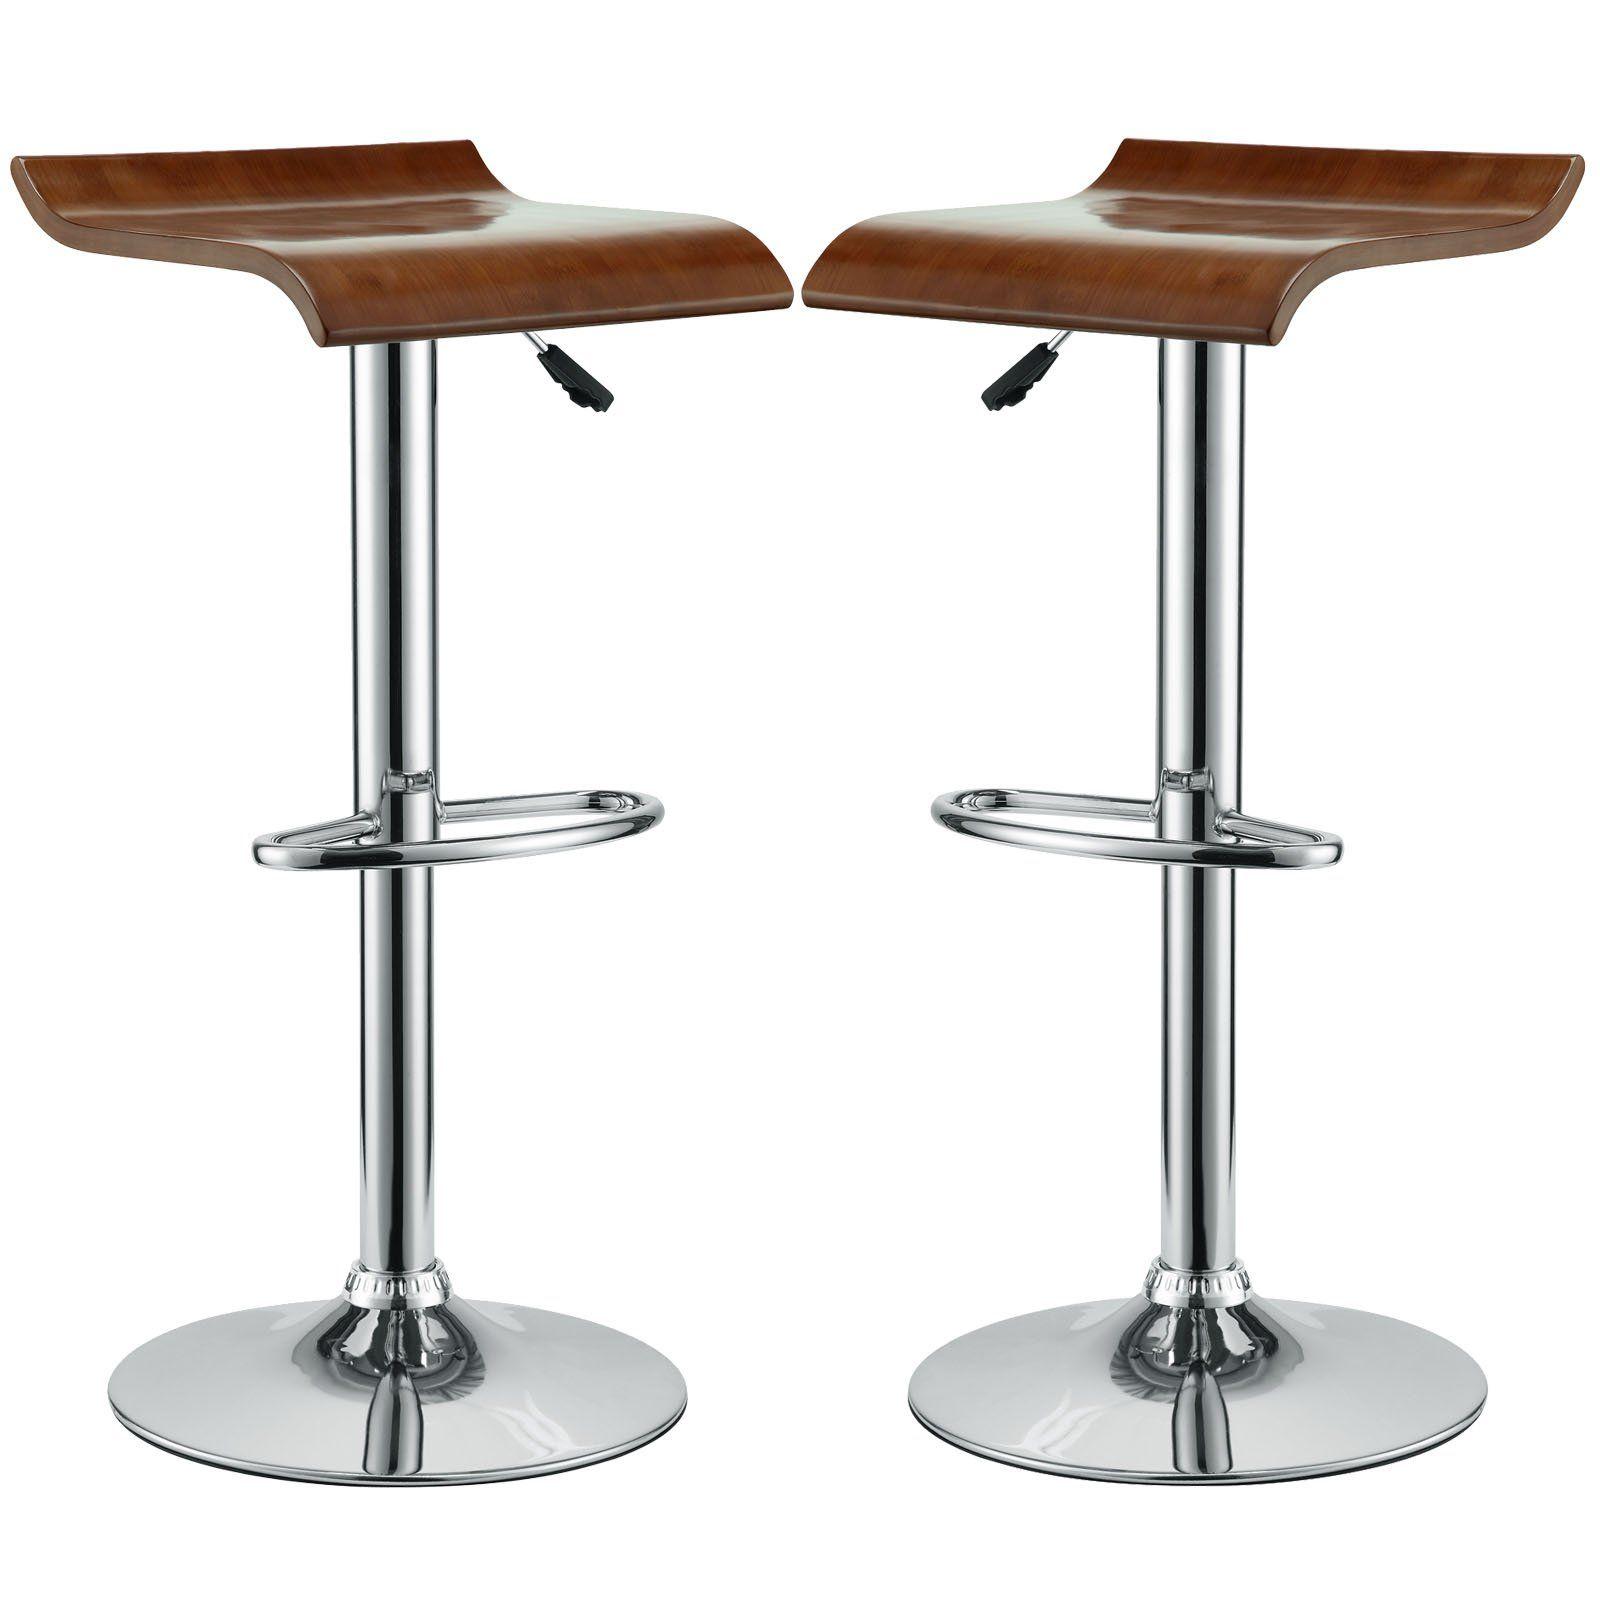 Modern Bentwood Counter Bar Stools Set Of 2 Counter Height Dining Chair In 2021 Modern Bar Stools Retro Bar Stools Bar Stools